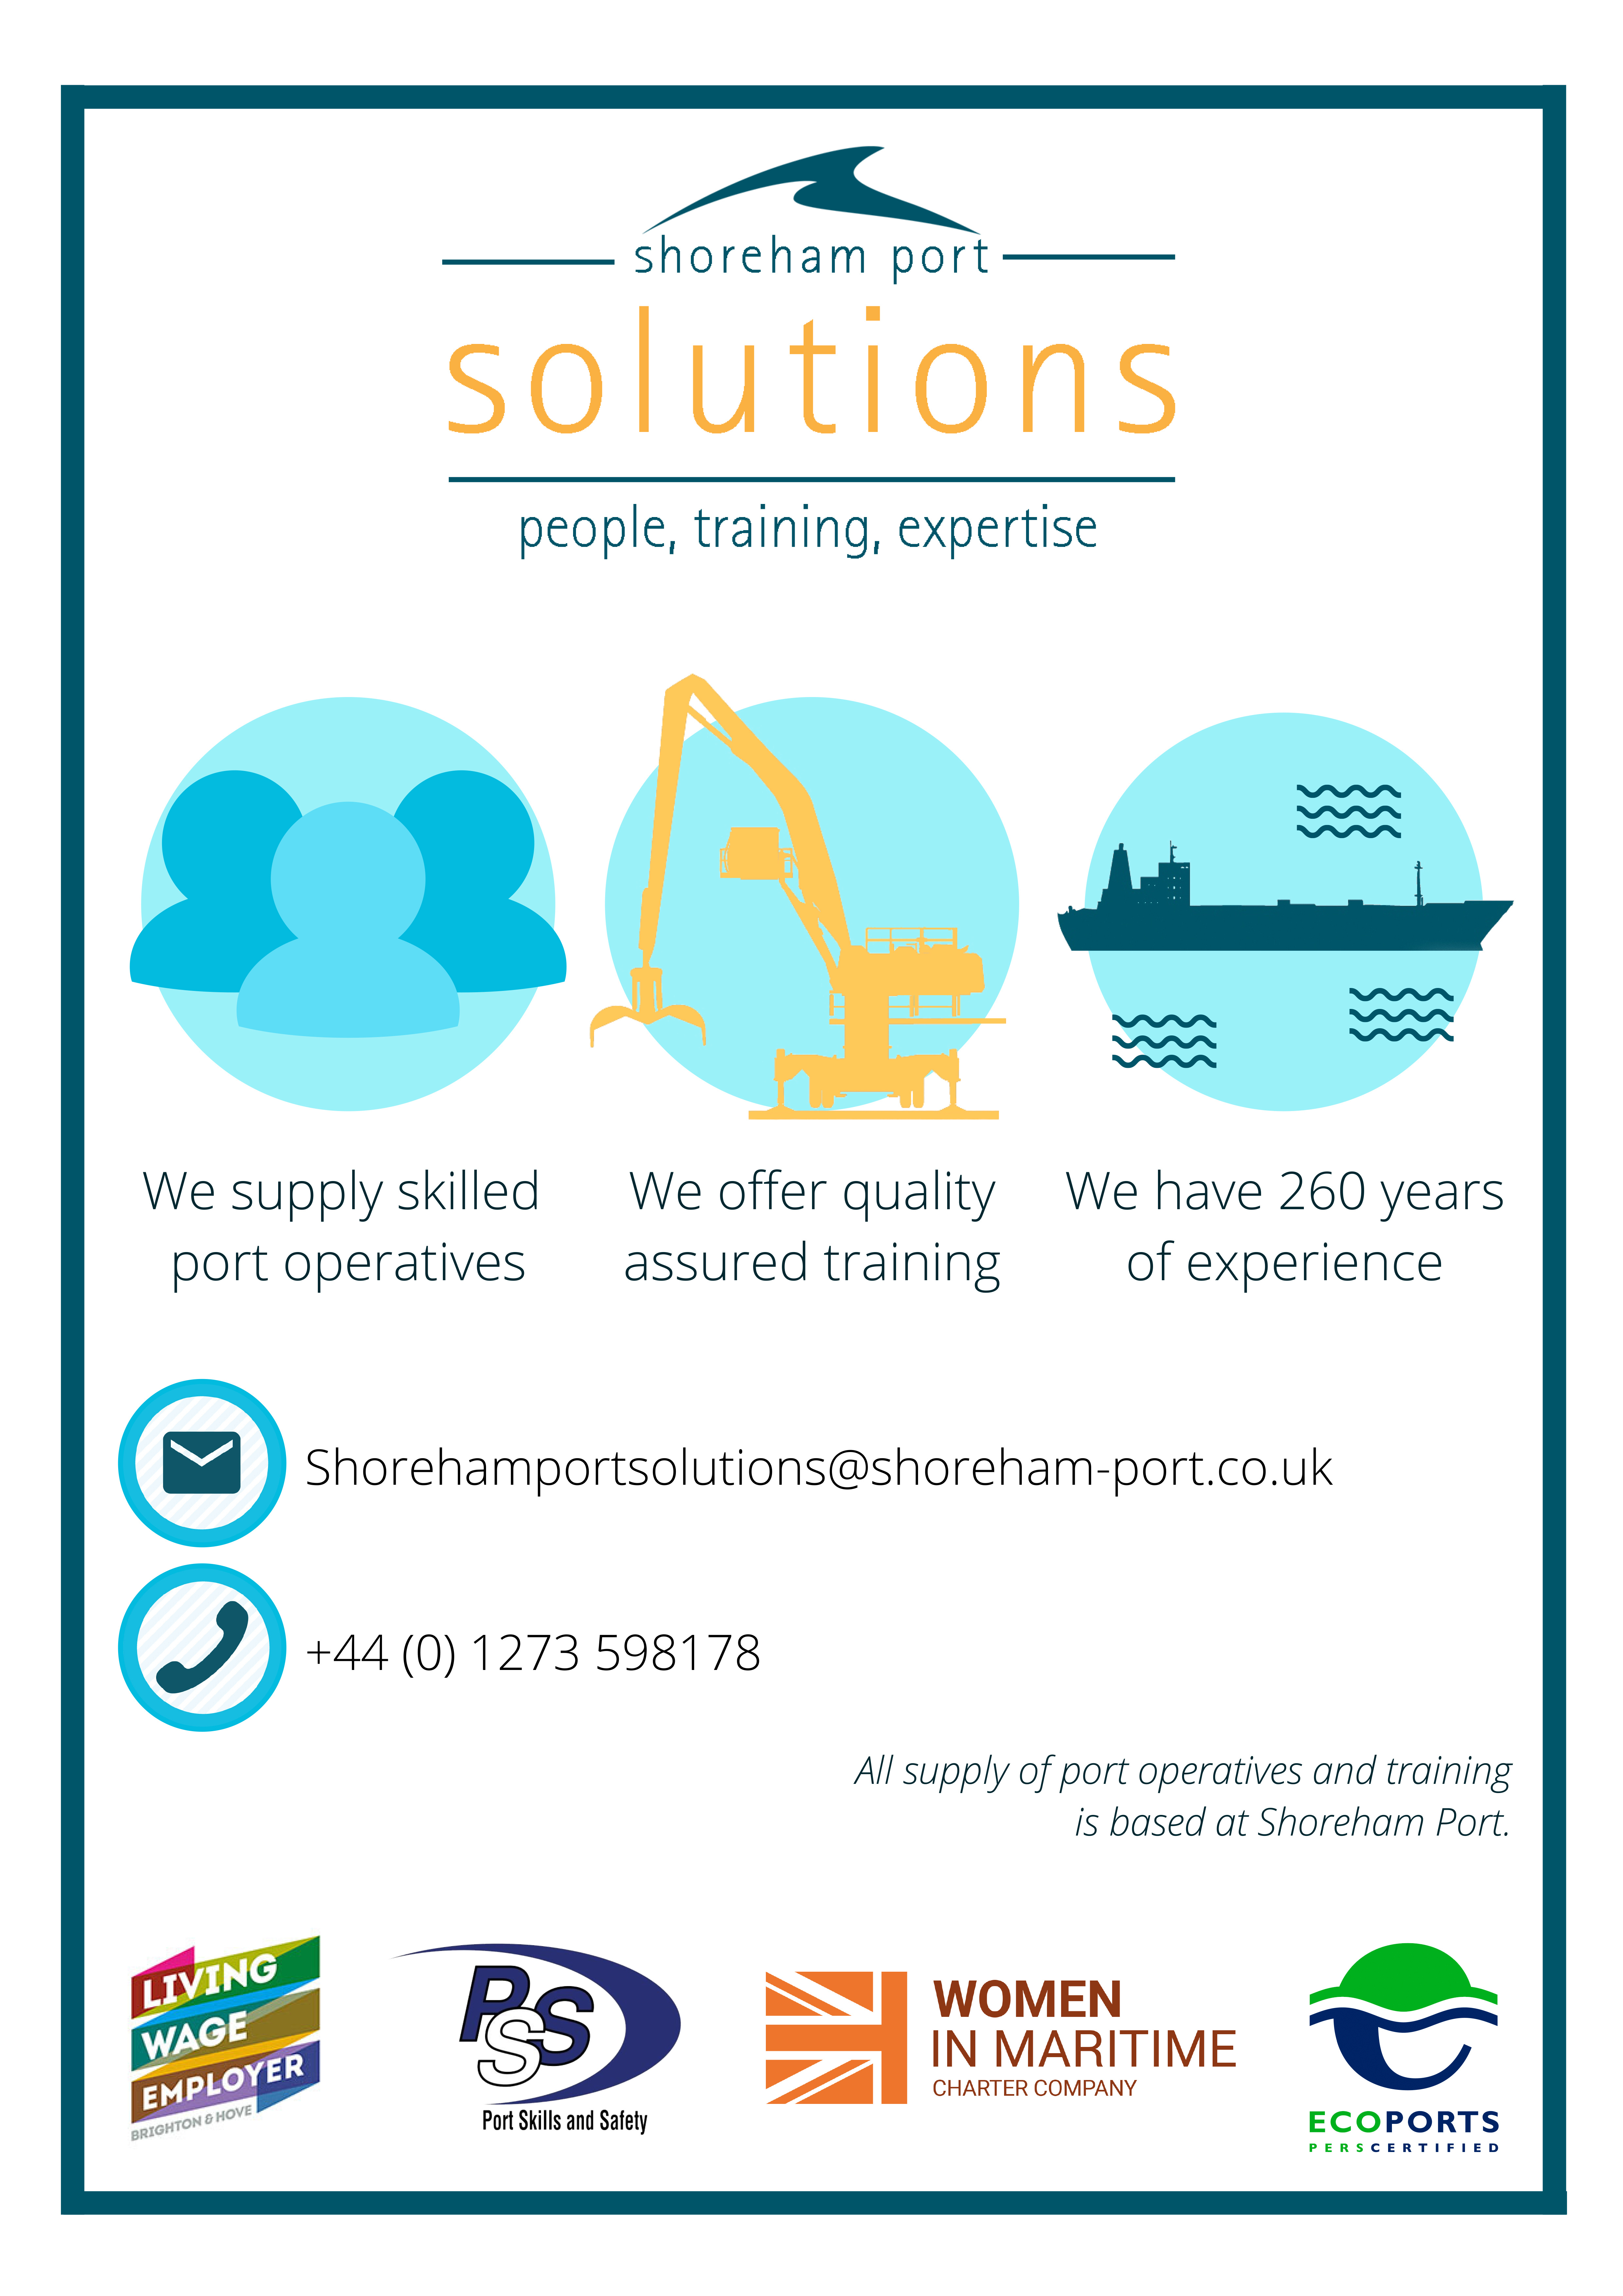 shoreham_port_solutions_poster_2_7016